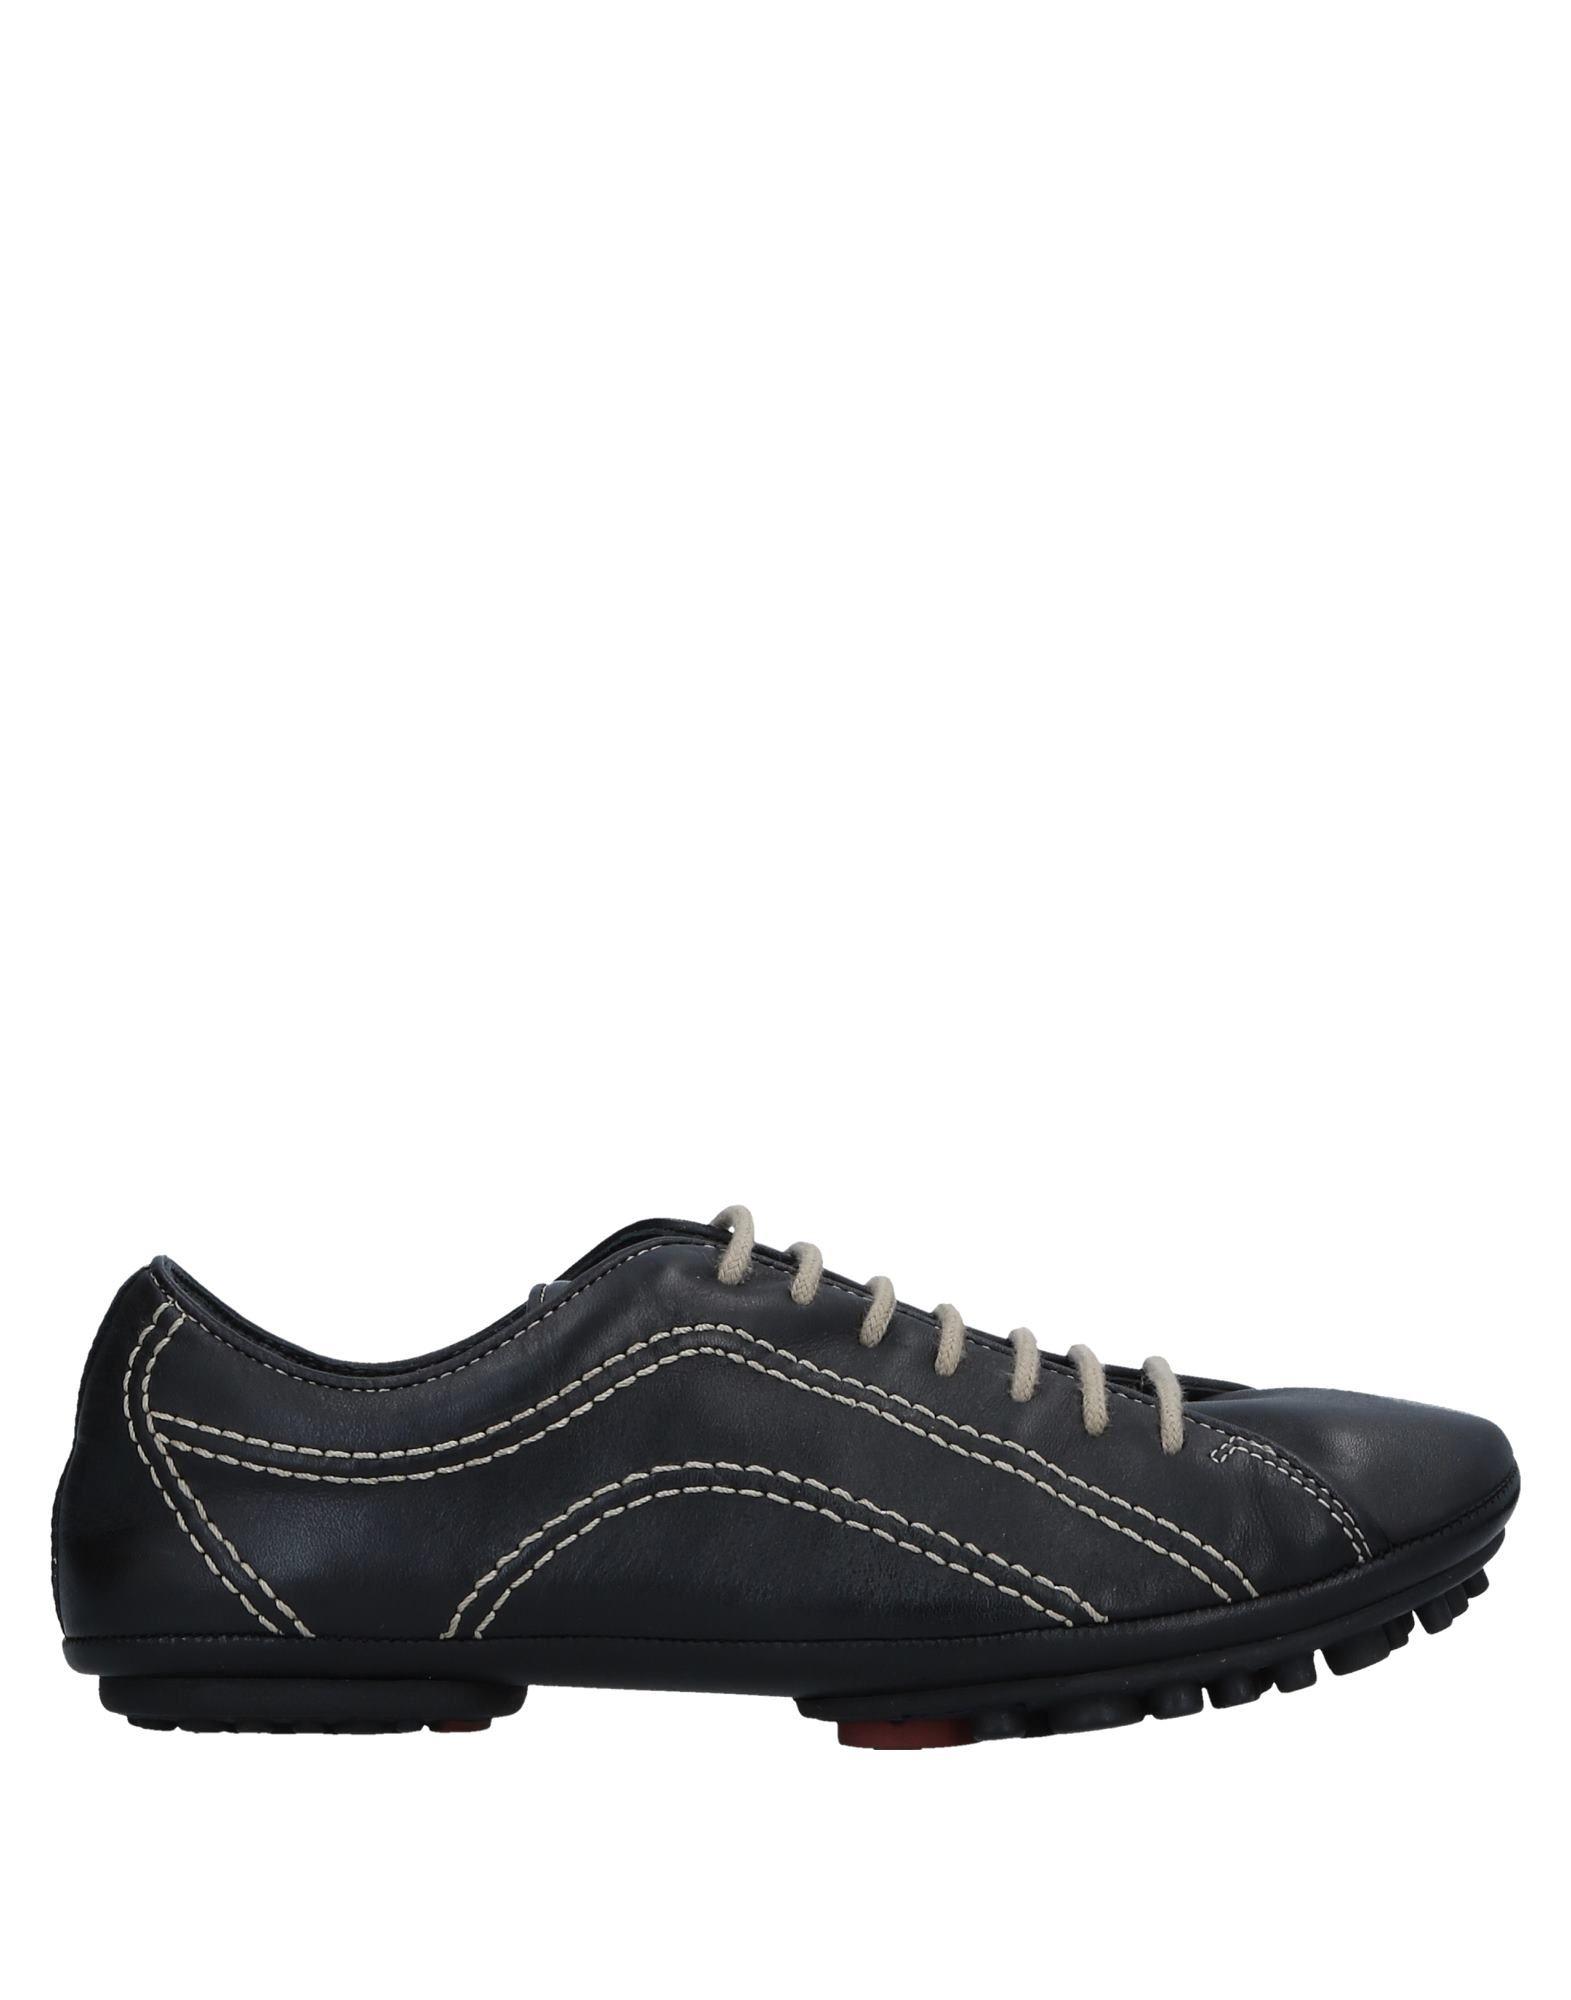 Moda Sneakers Sneakers Moda Camper Donna - 11520183XG a85d71